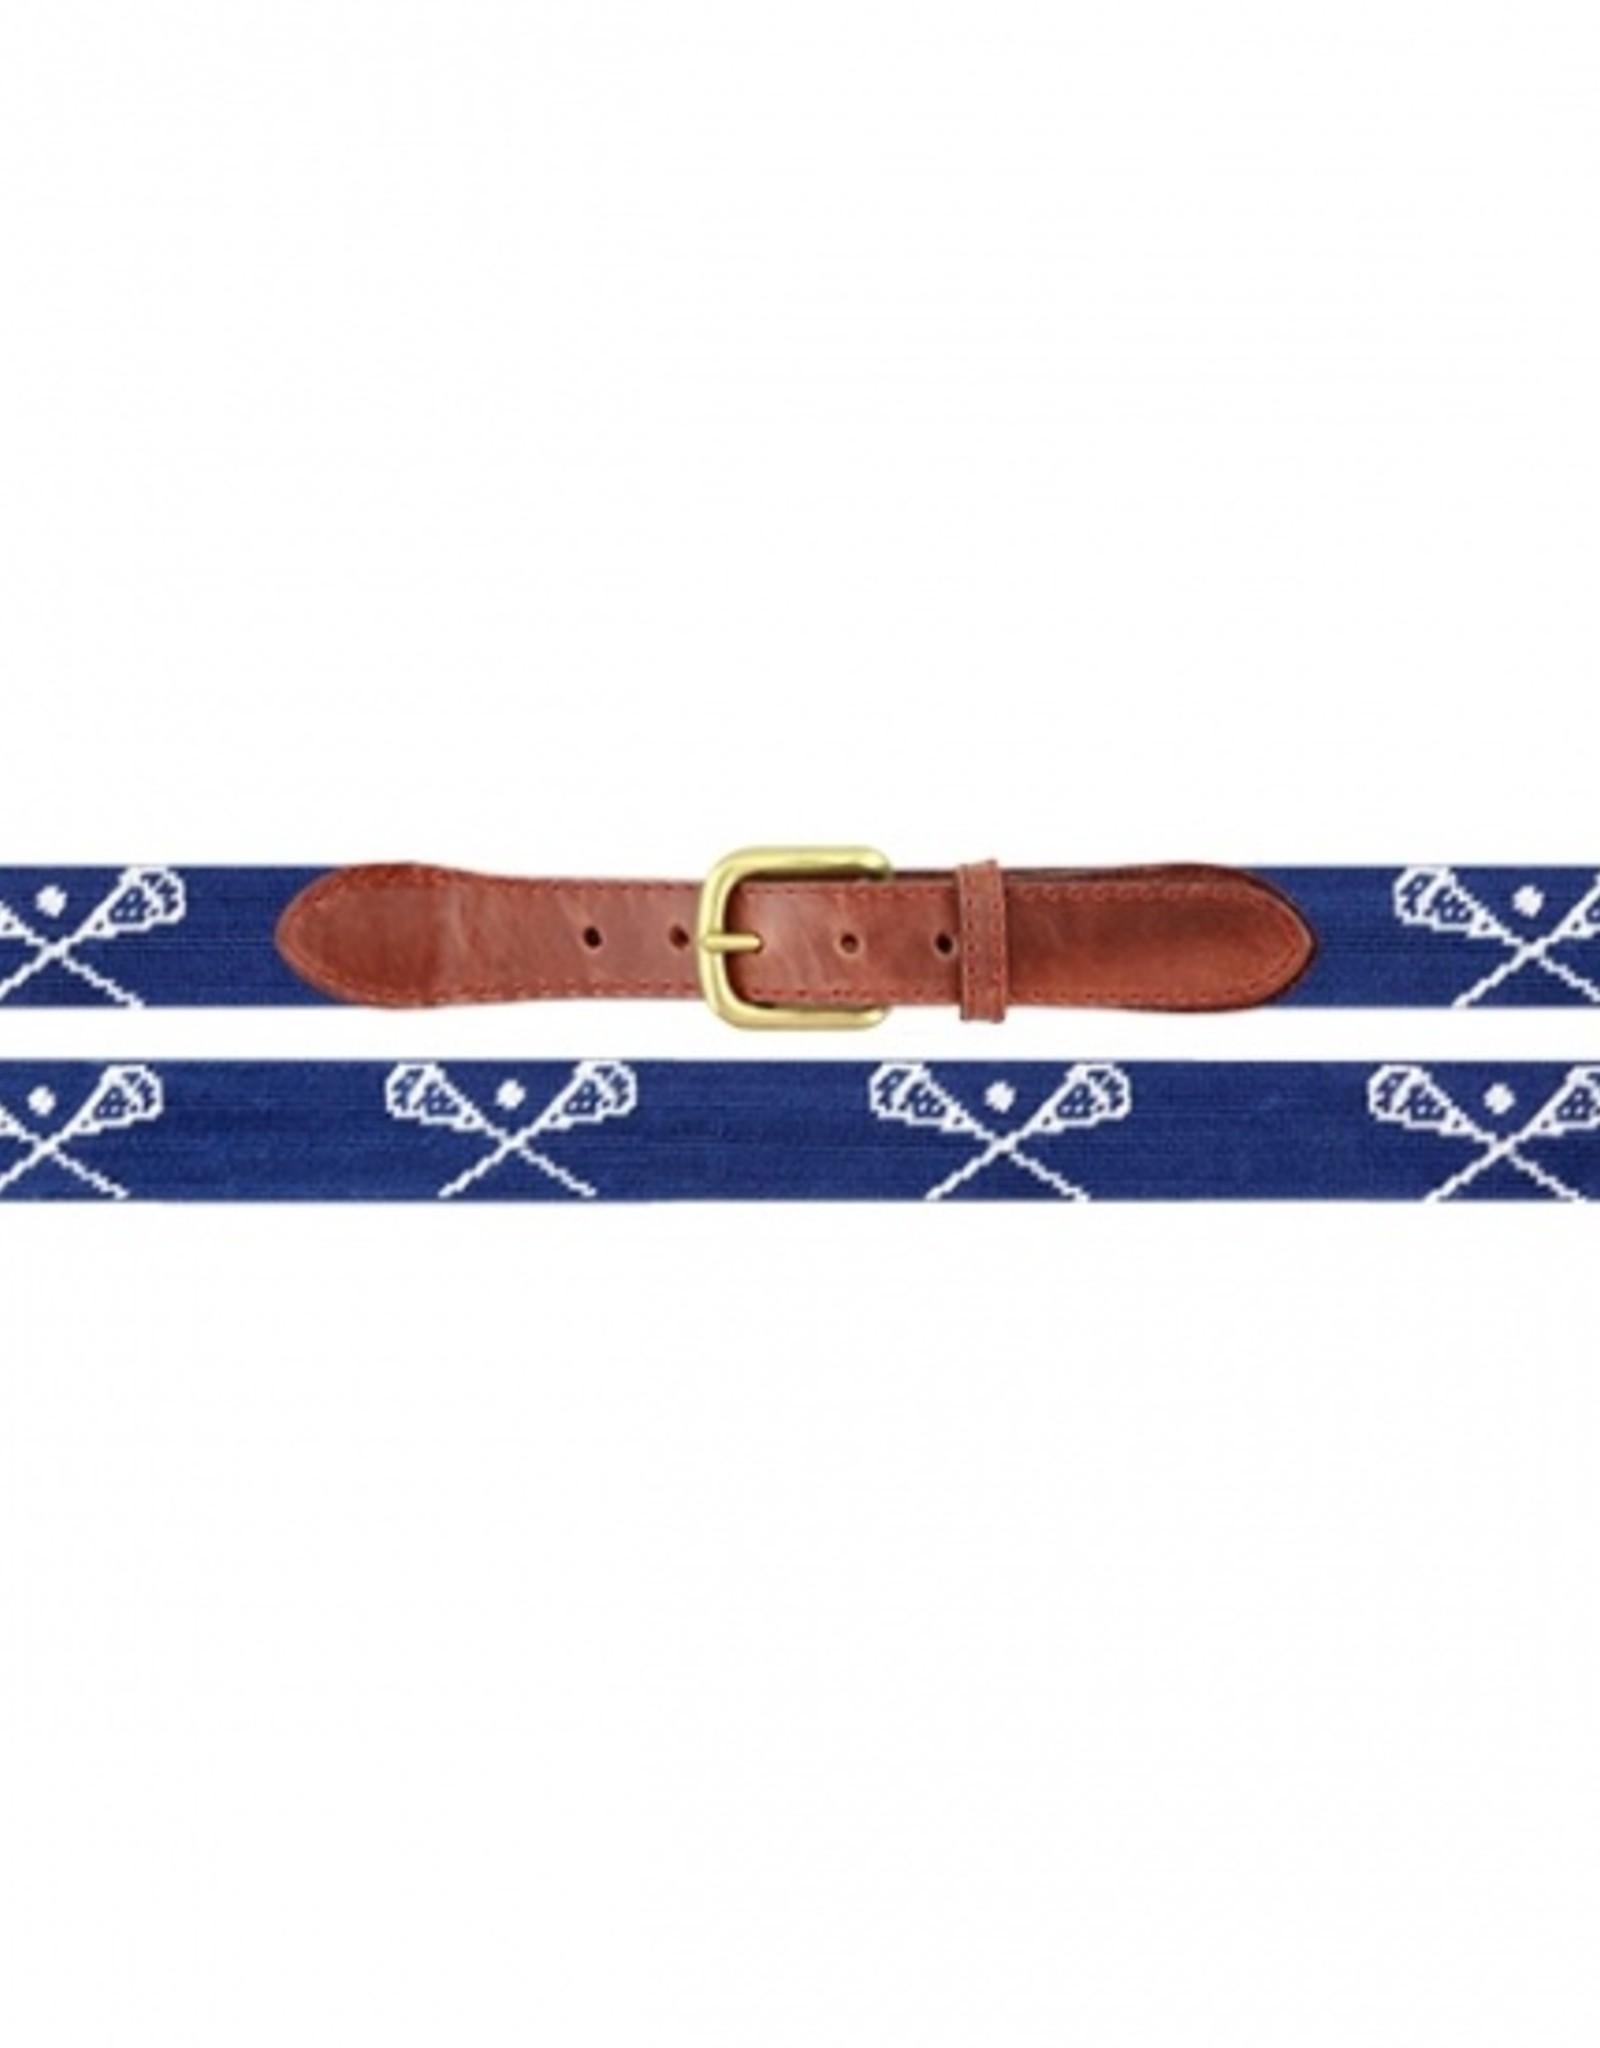 Smathers and Branson Crossed LAX Sticks Needlepoint Belt